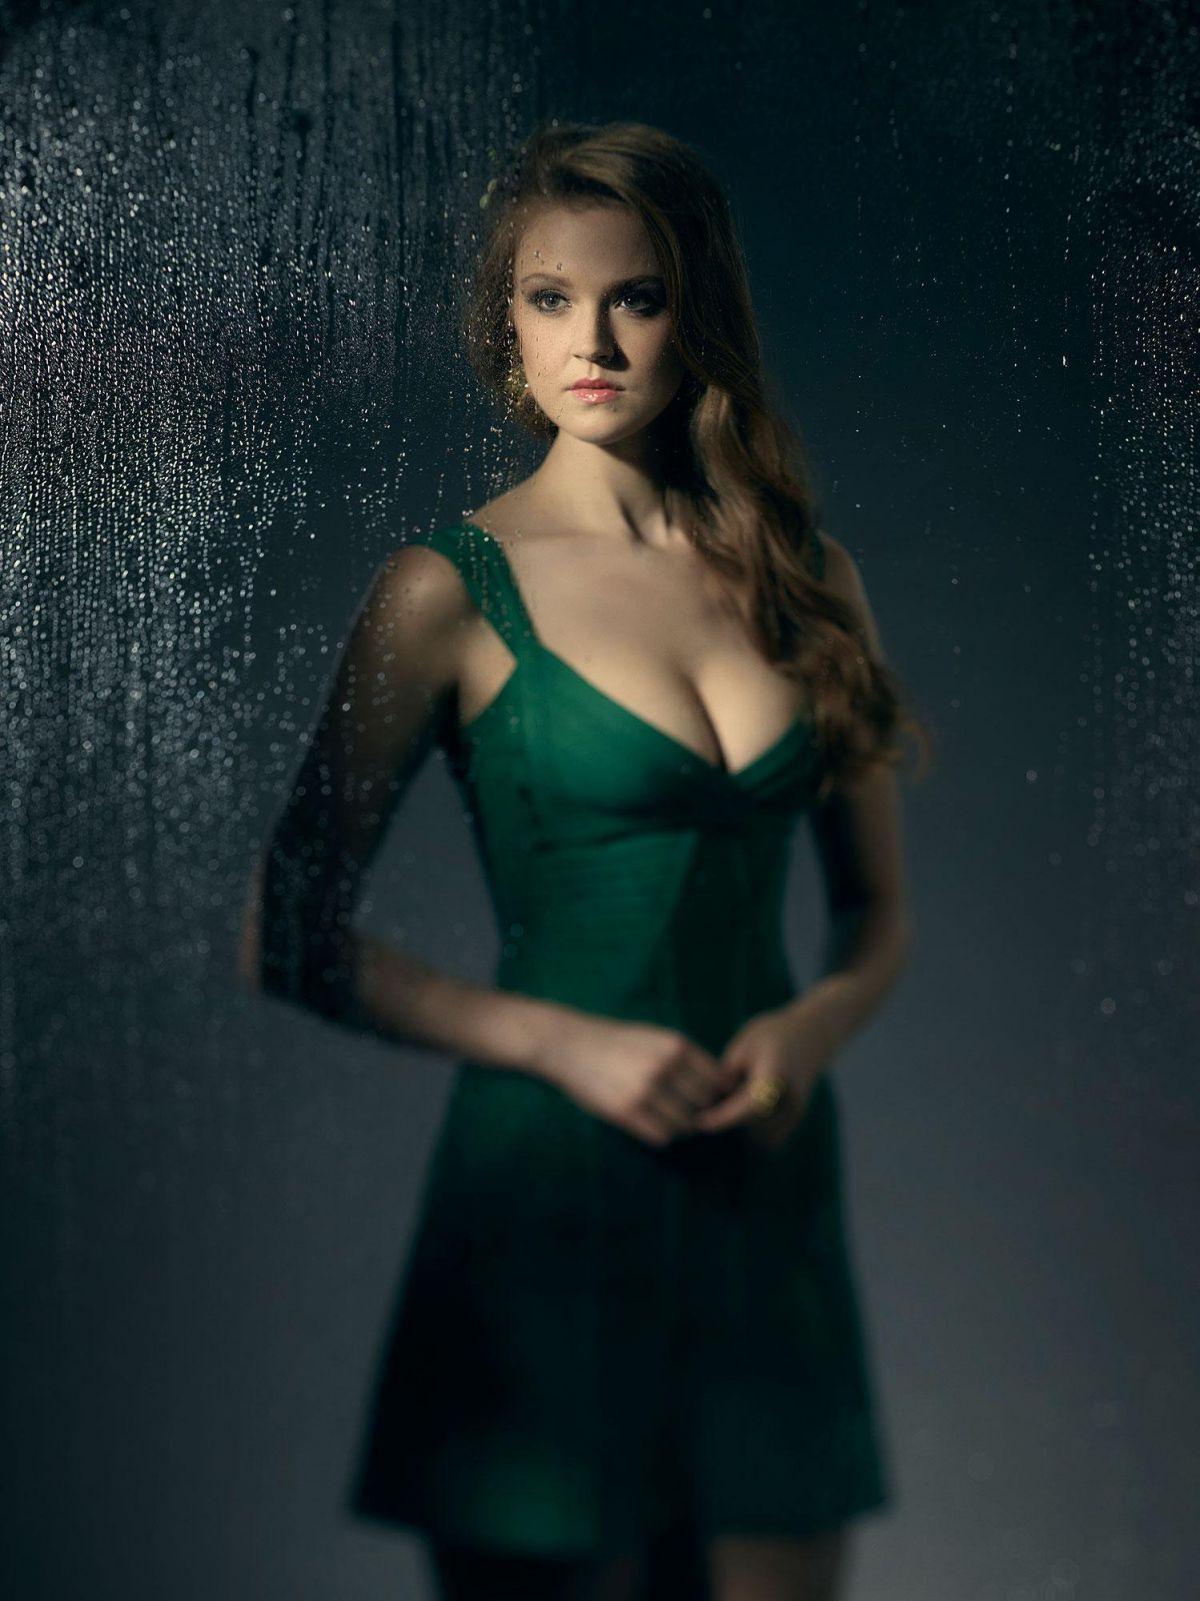 MAGGIE GEHA - Gotham, Season 3 Promo